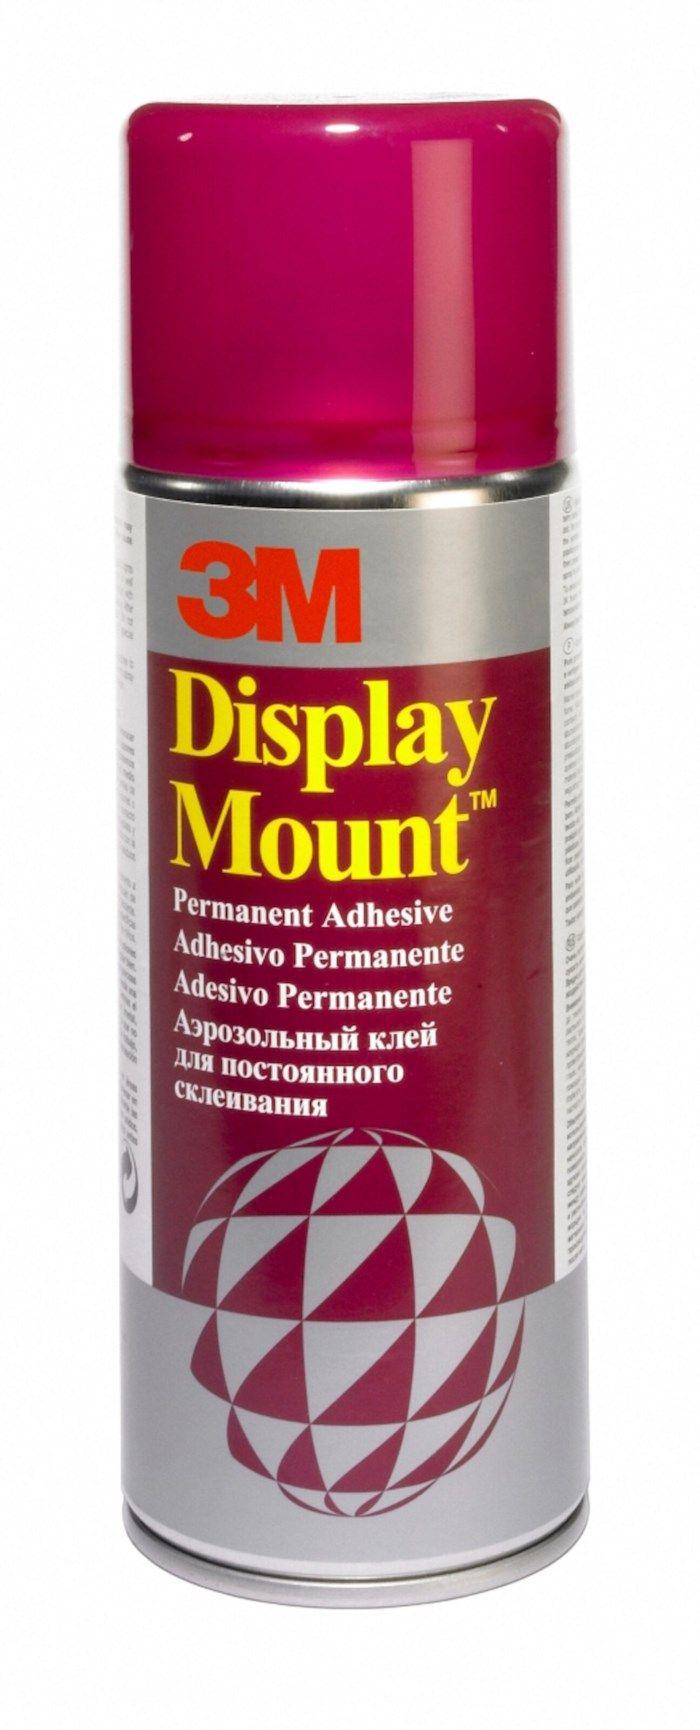 3M Display mount Spraylim